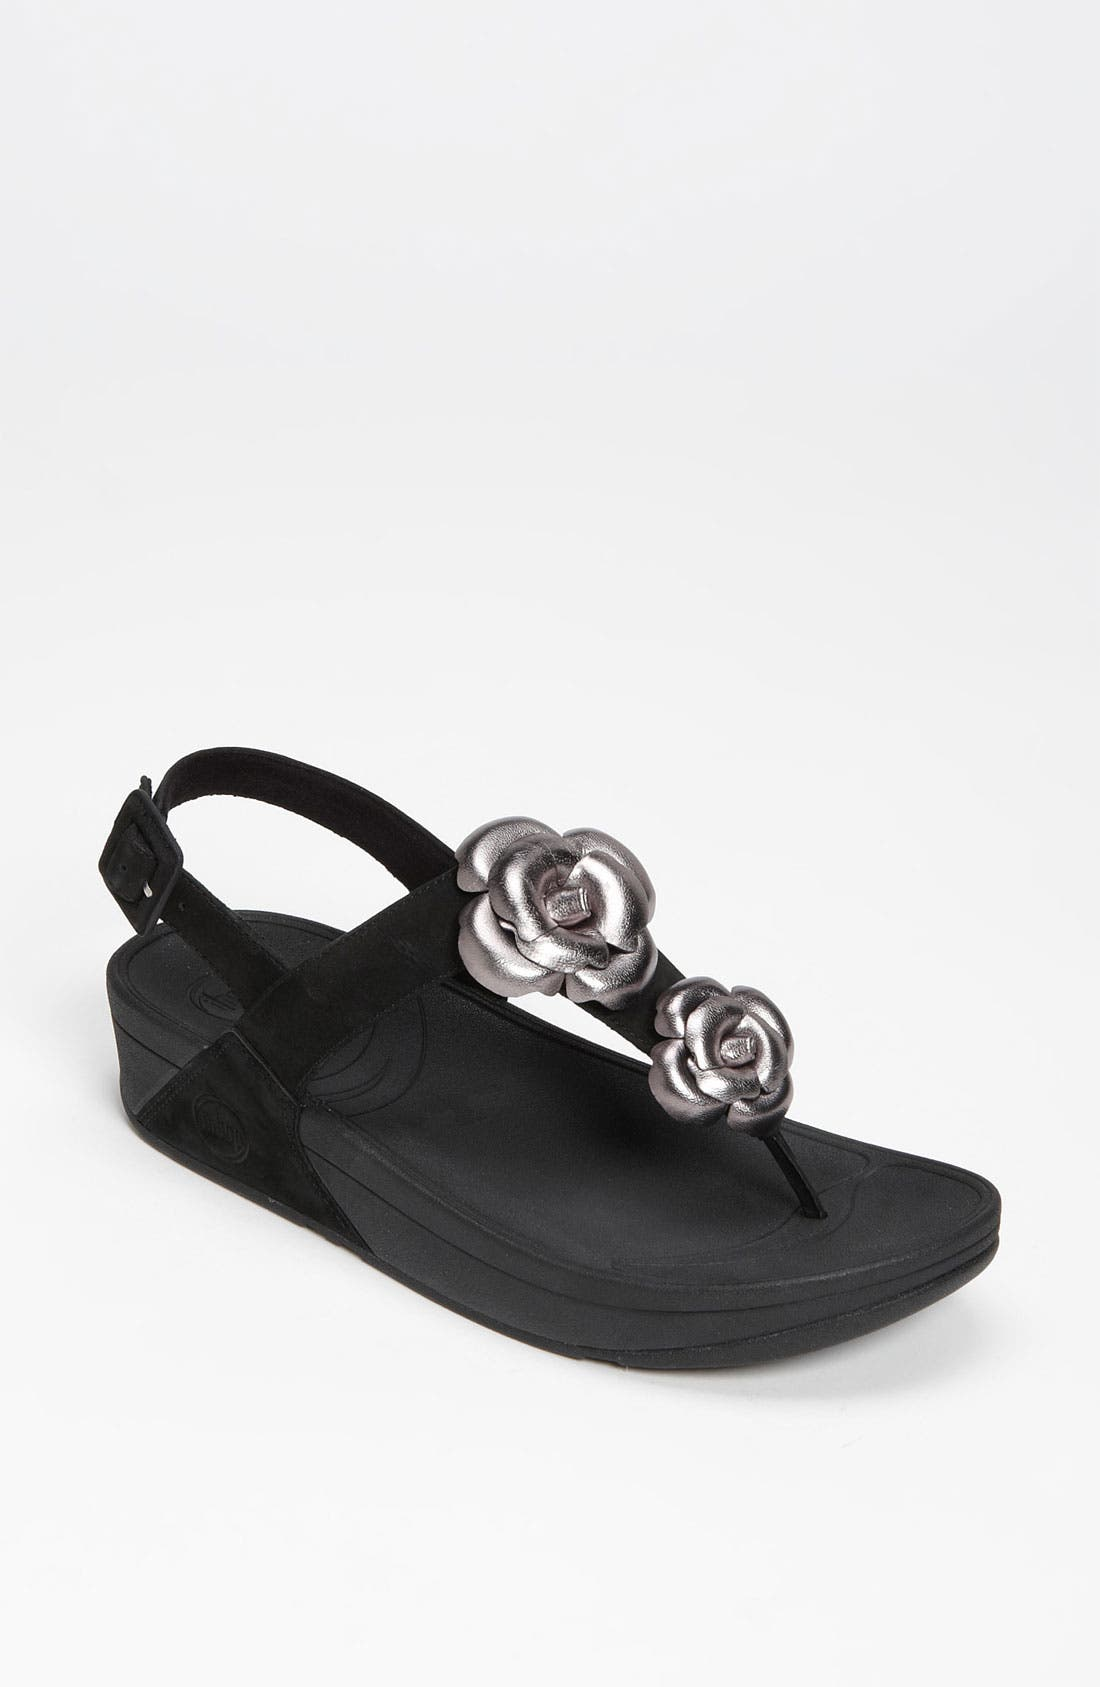 Alternate Image 1 Selected - FitFlop 'Floretta' Sandal